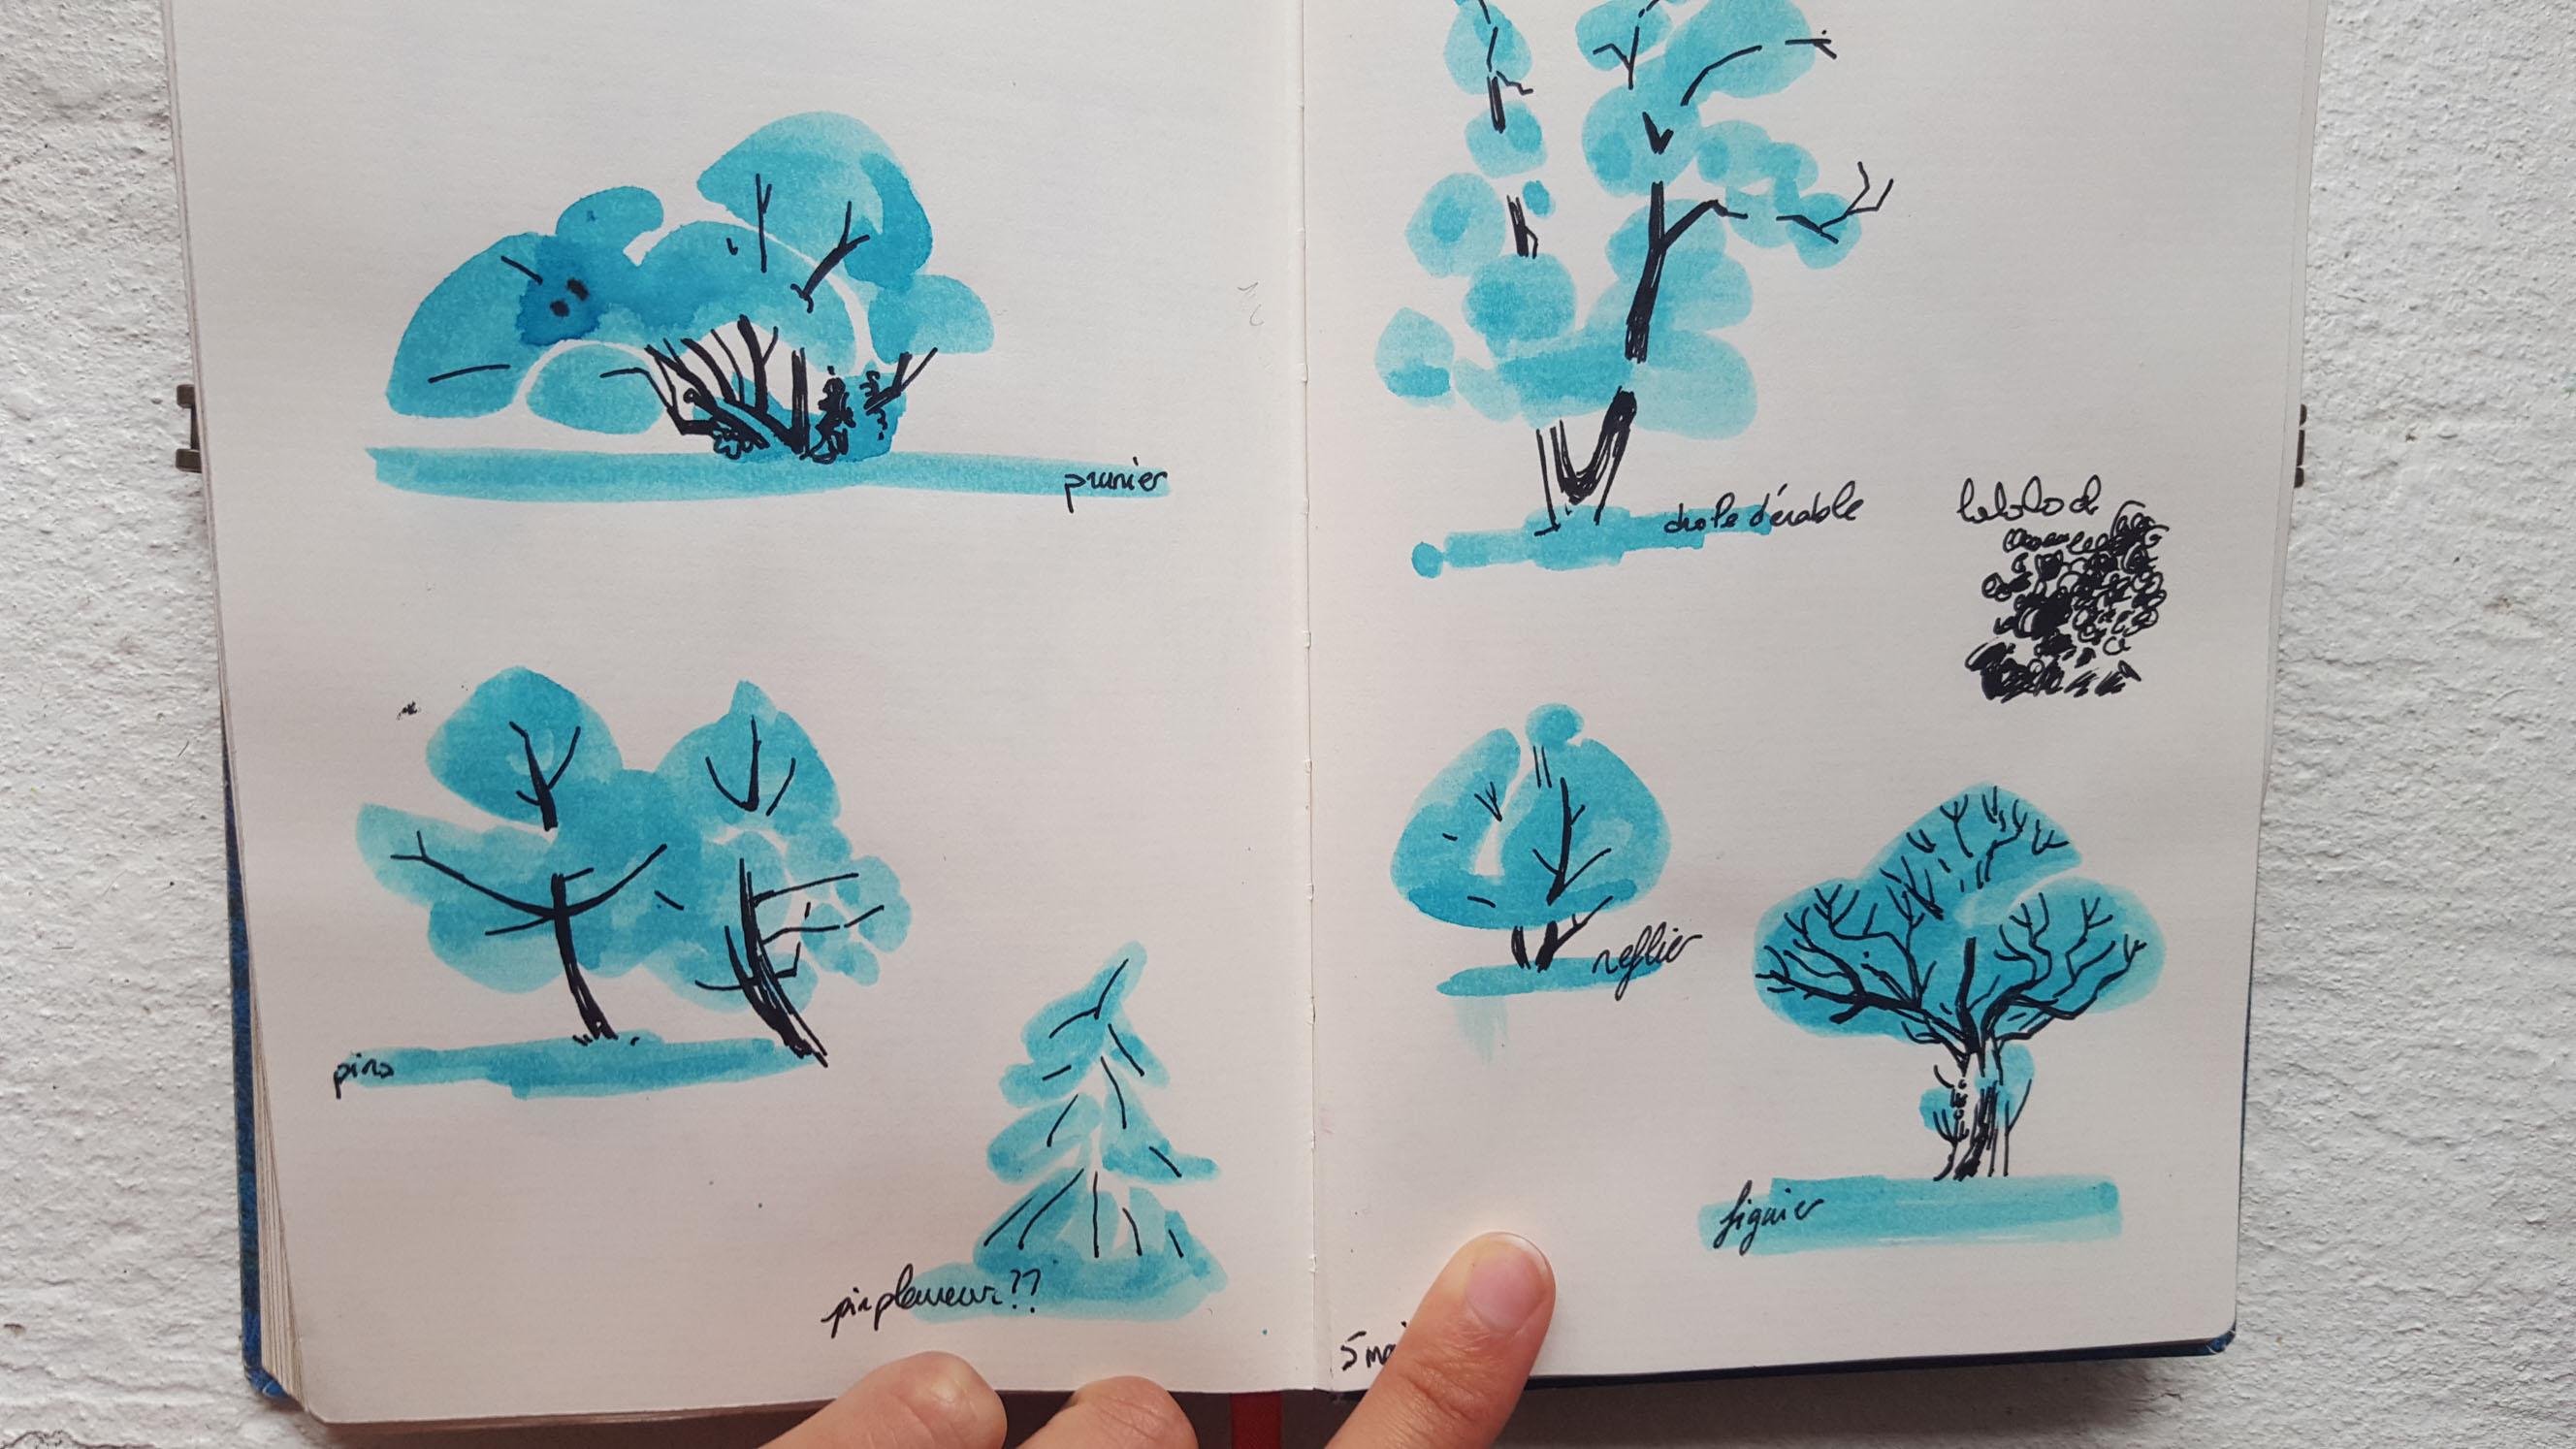 Sketchbook : IsaArne [ Challenge de l'ete P7 ] - Page 5 Facecr38